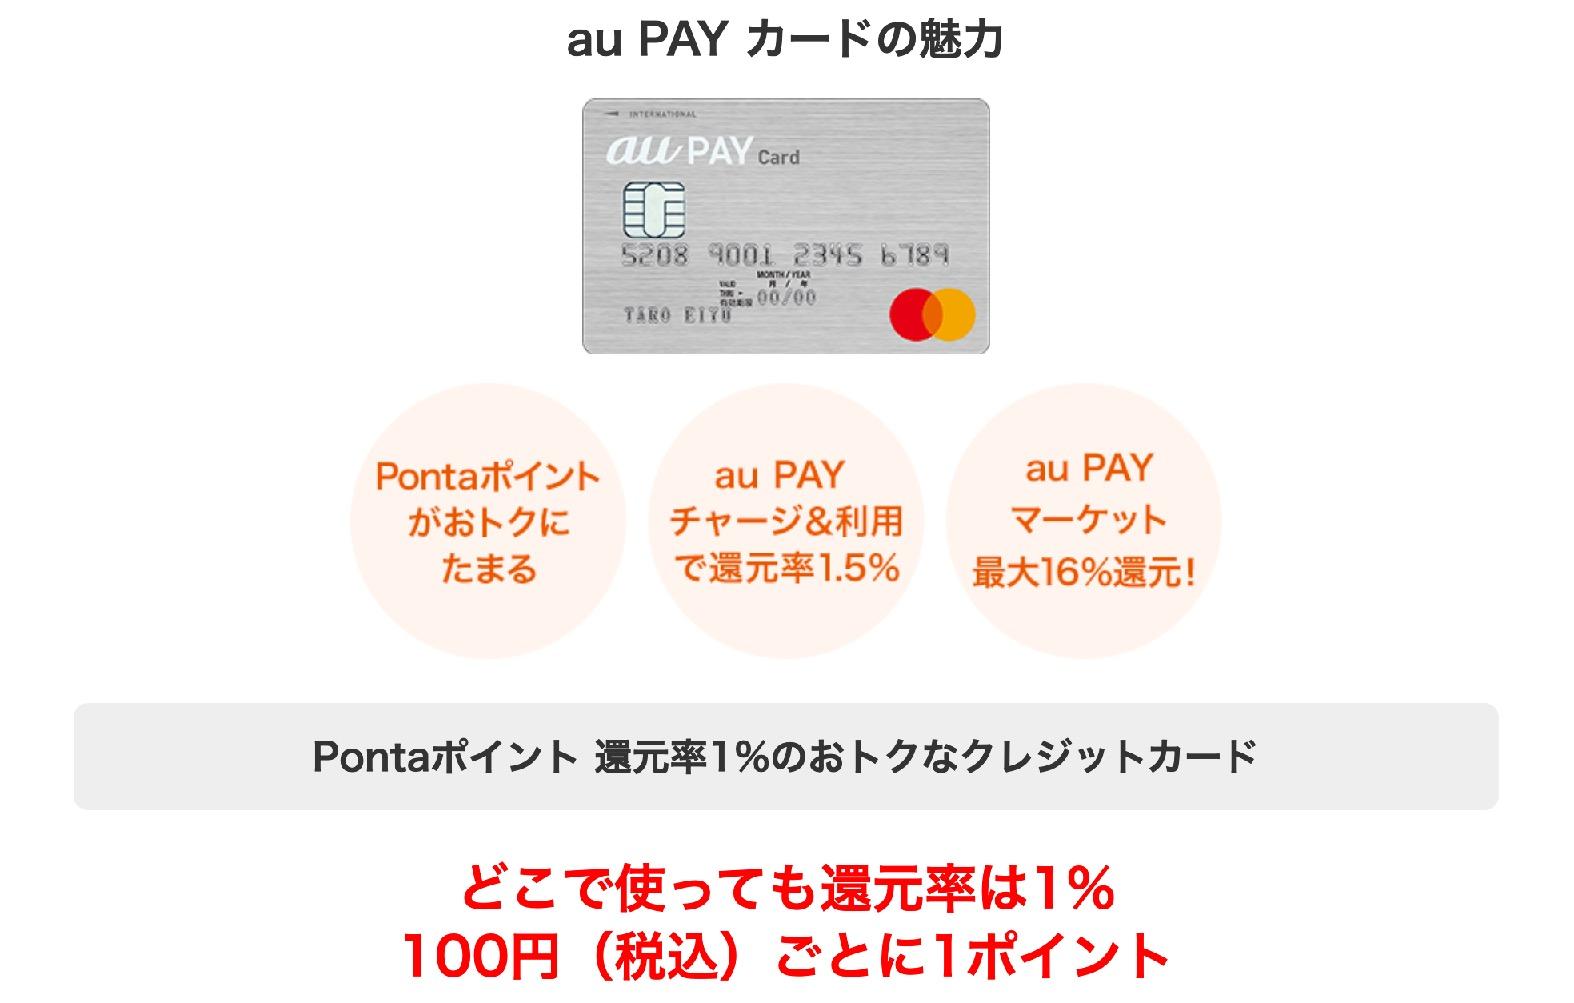 au Payカードの特徴